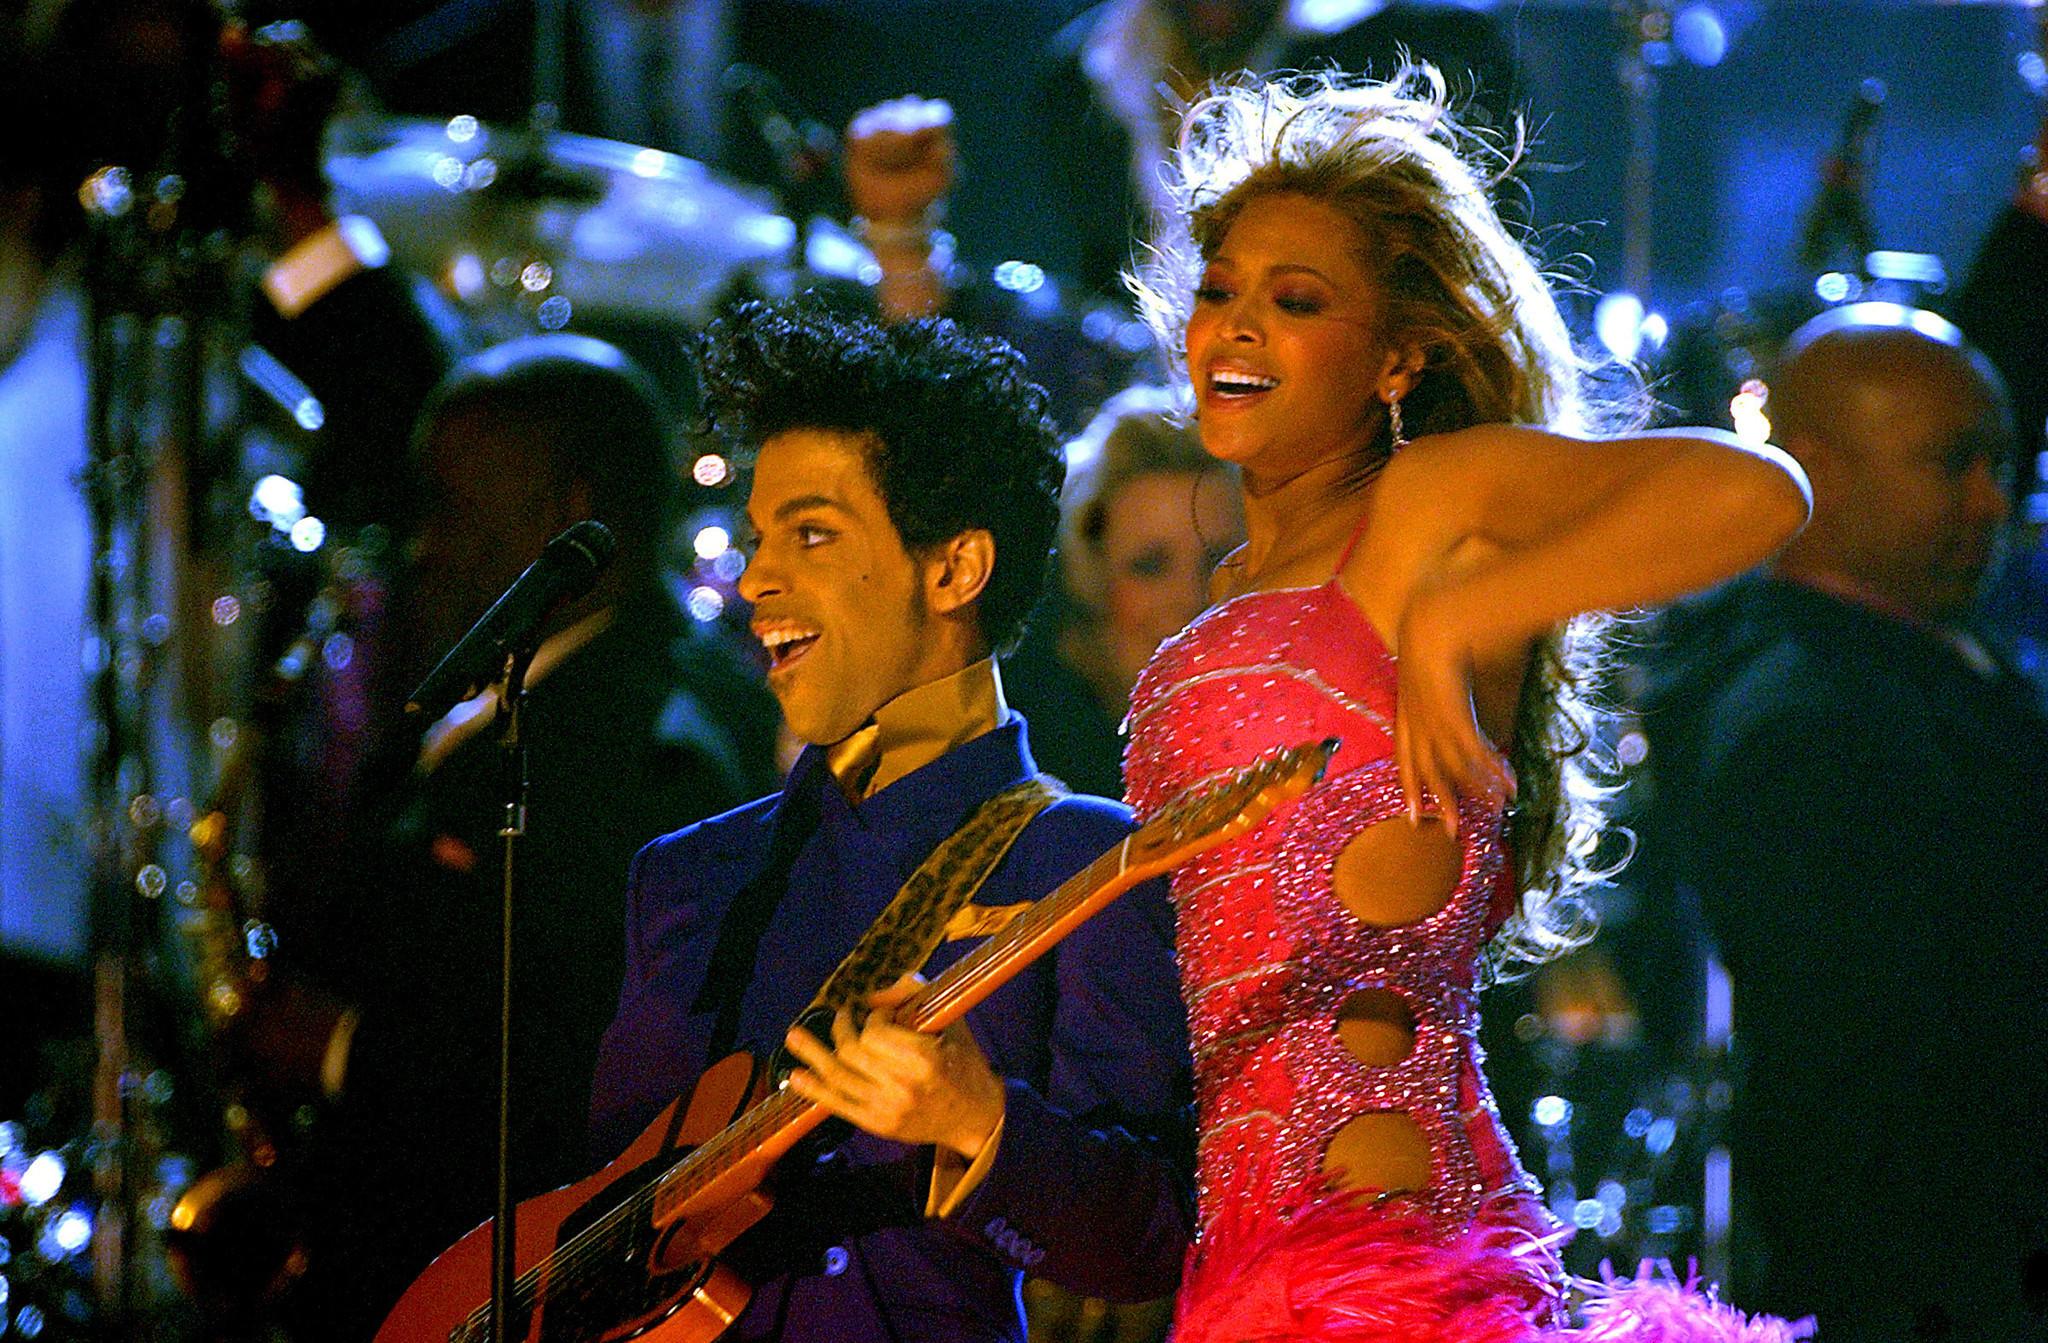 Beyonce Grammys: Grammys 2017 Updates: Adele Wins Big But Still Bows To